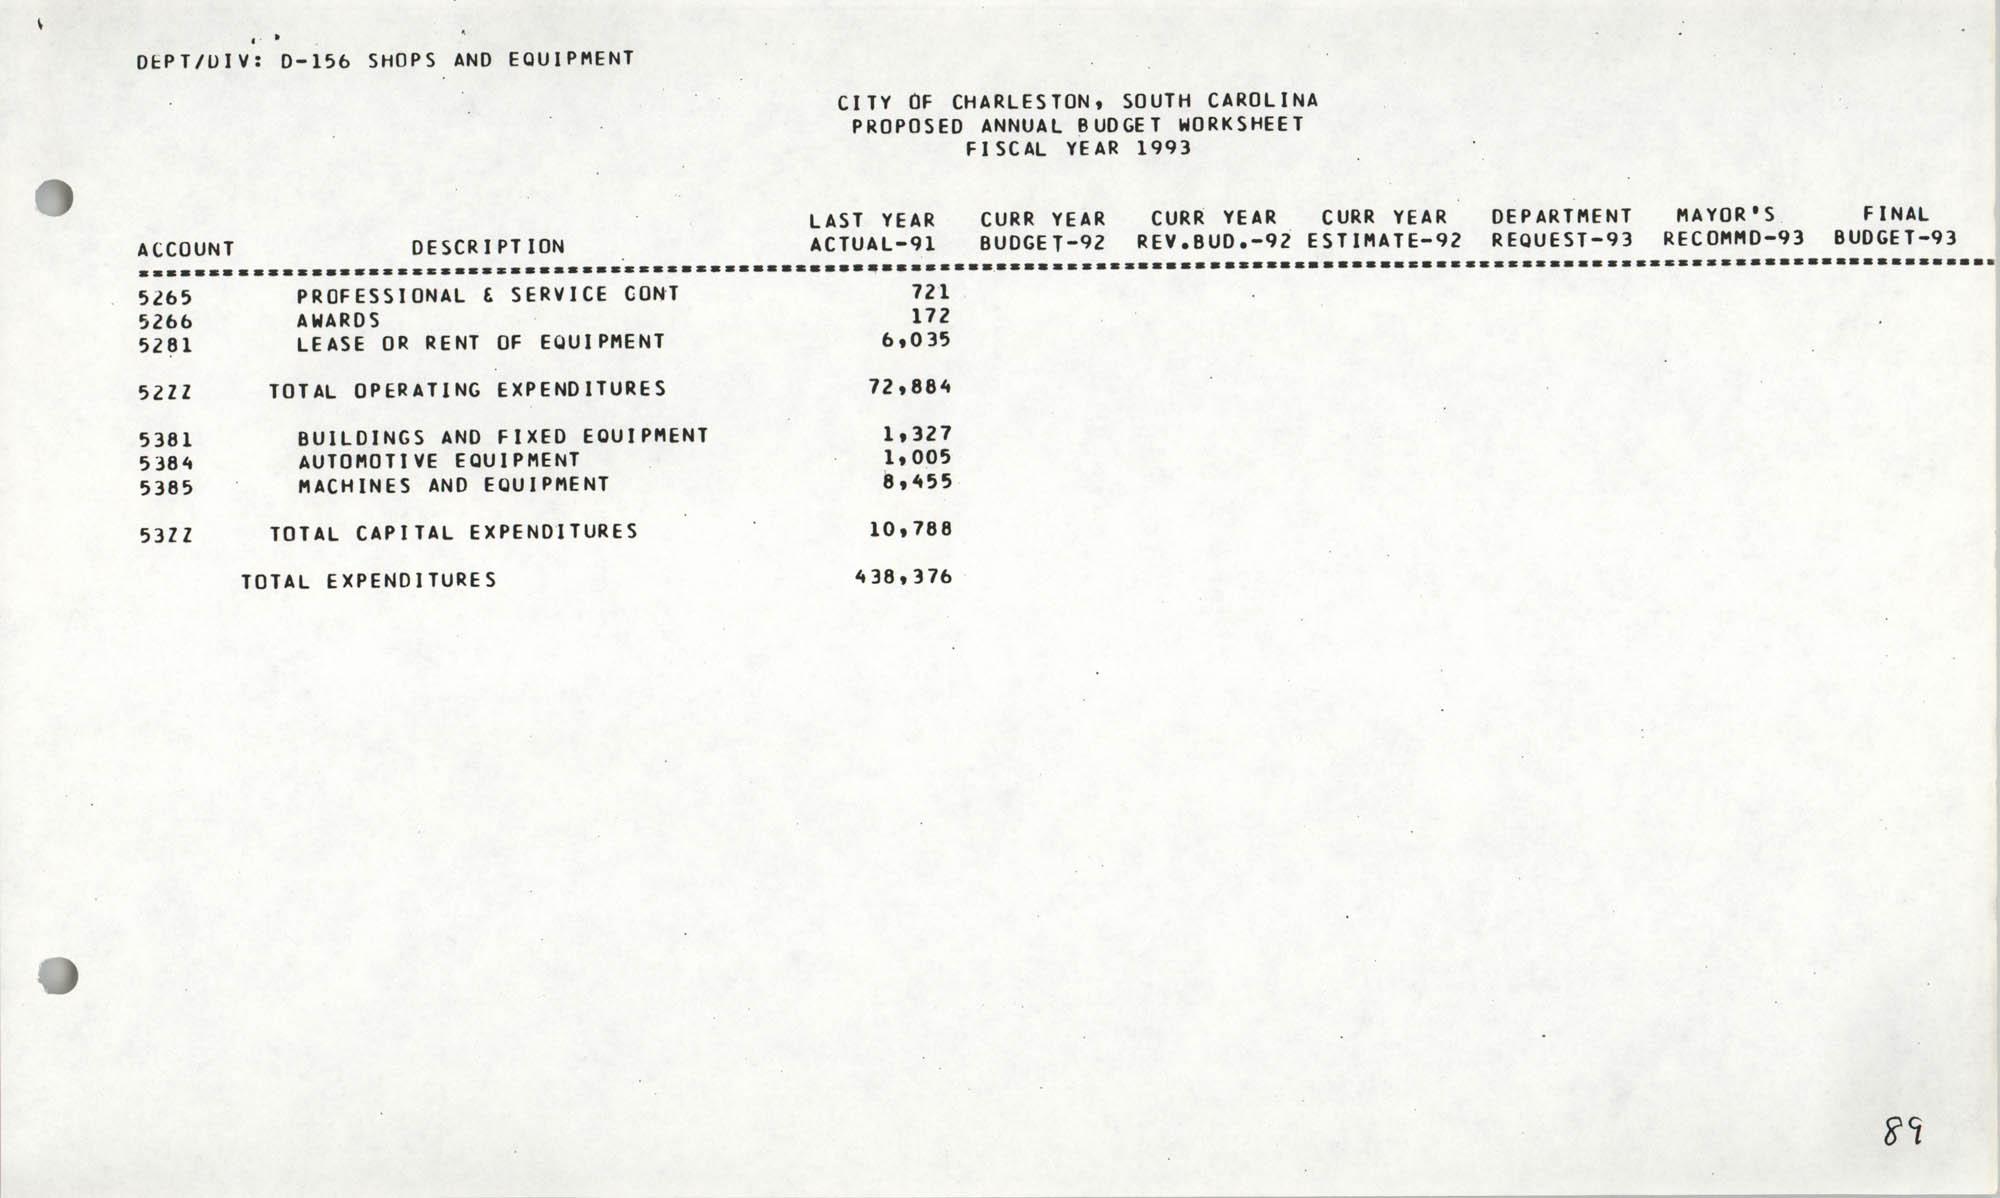 The City Council of Charleston, South Carolina, 1993 Budget, Page 89